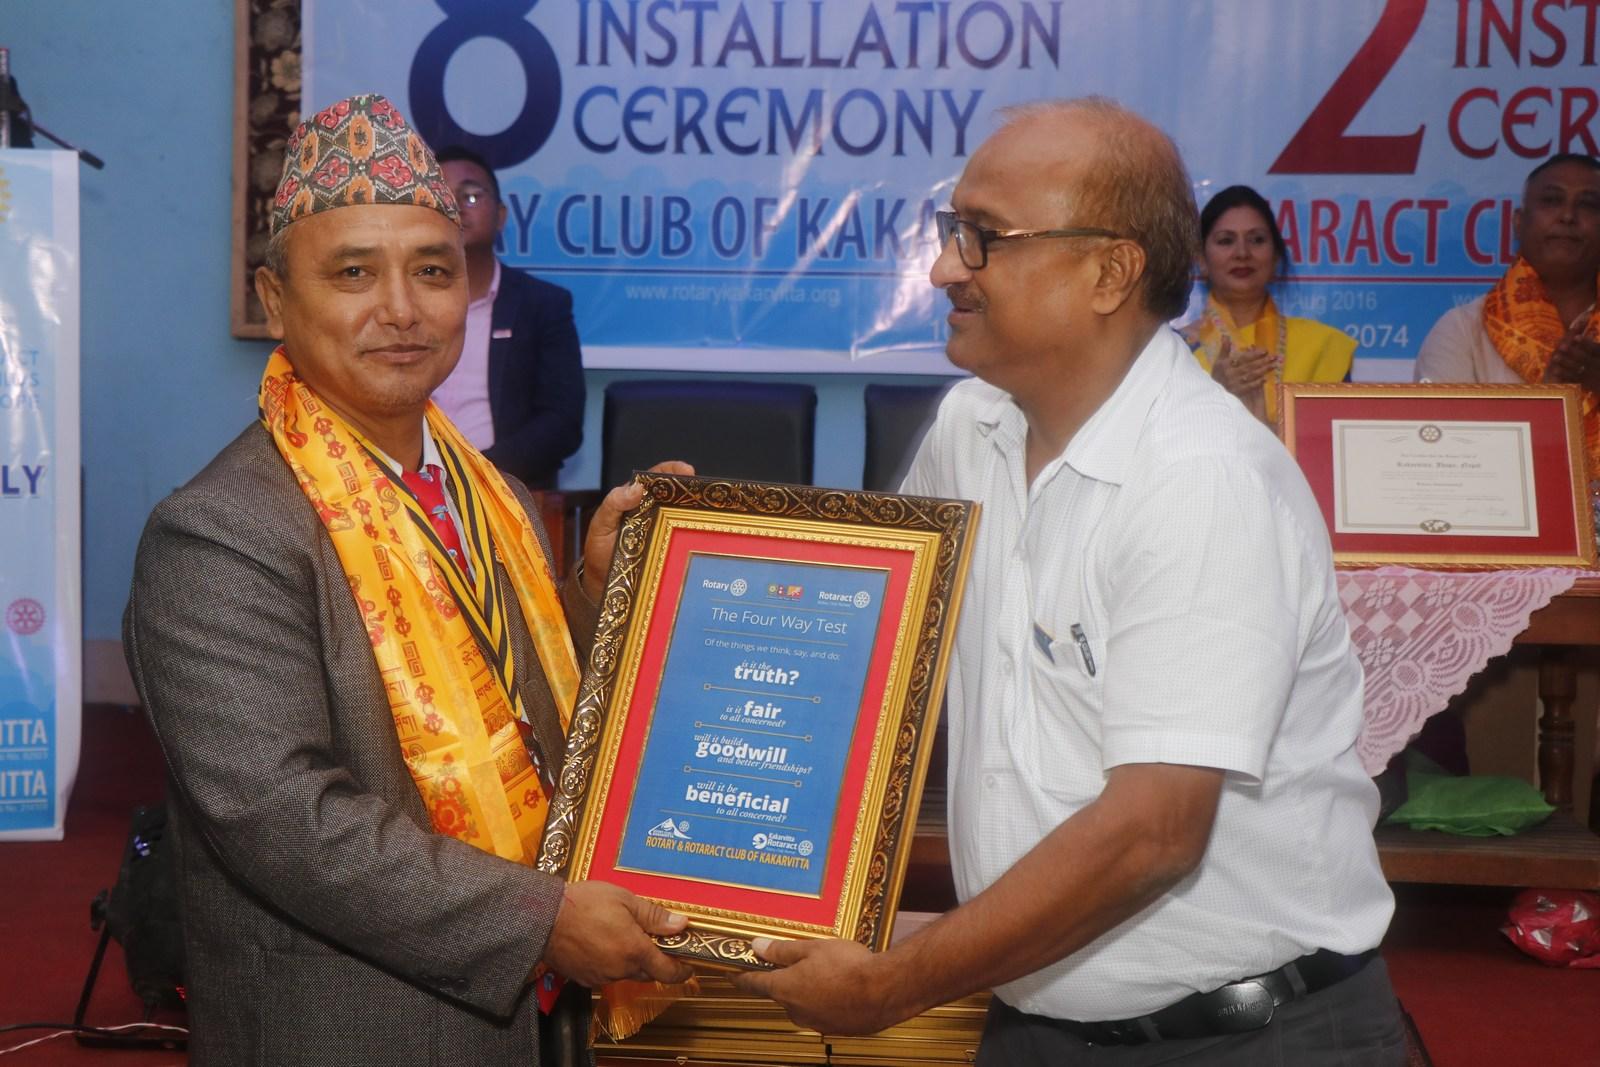 8th-Installation-Ceremony-Rotary-Club-of-Kakarvitta-106